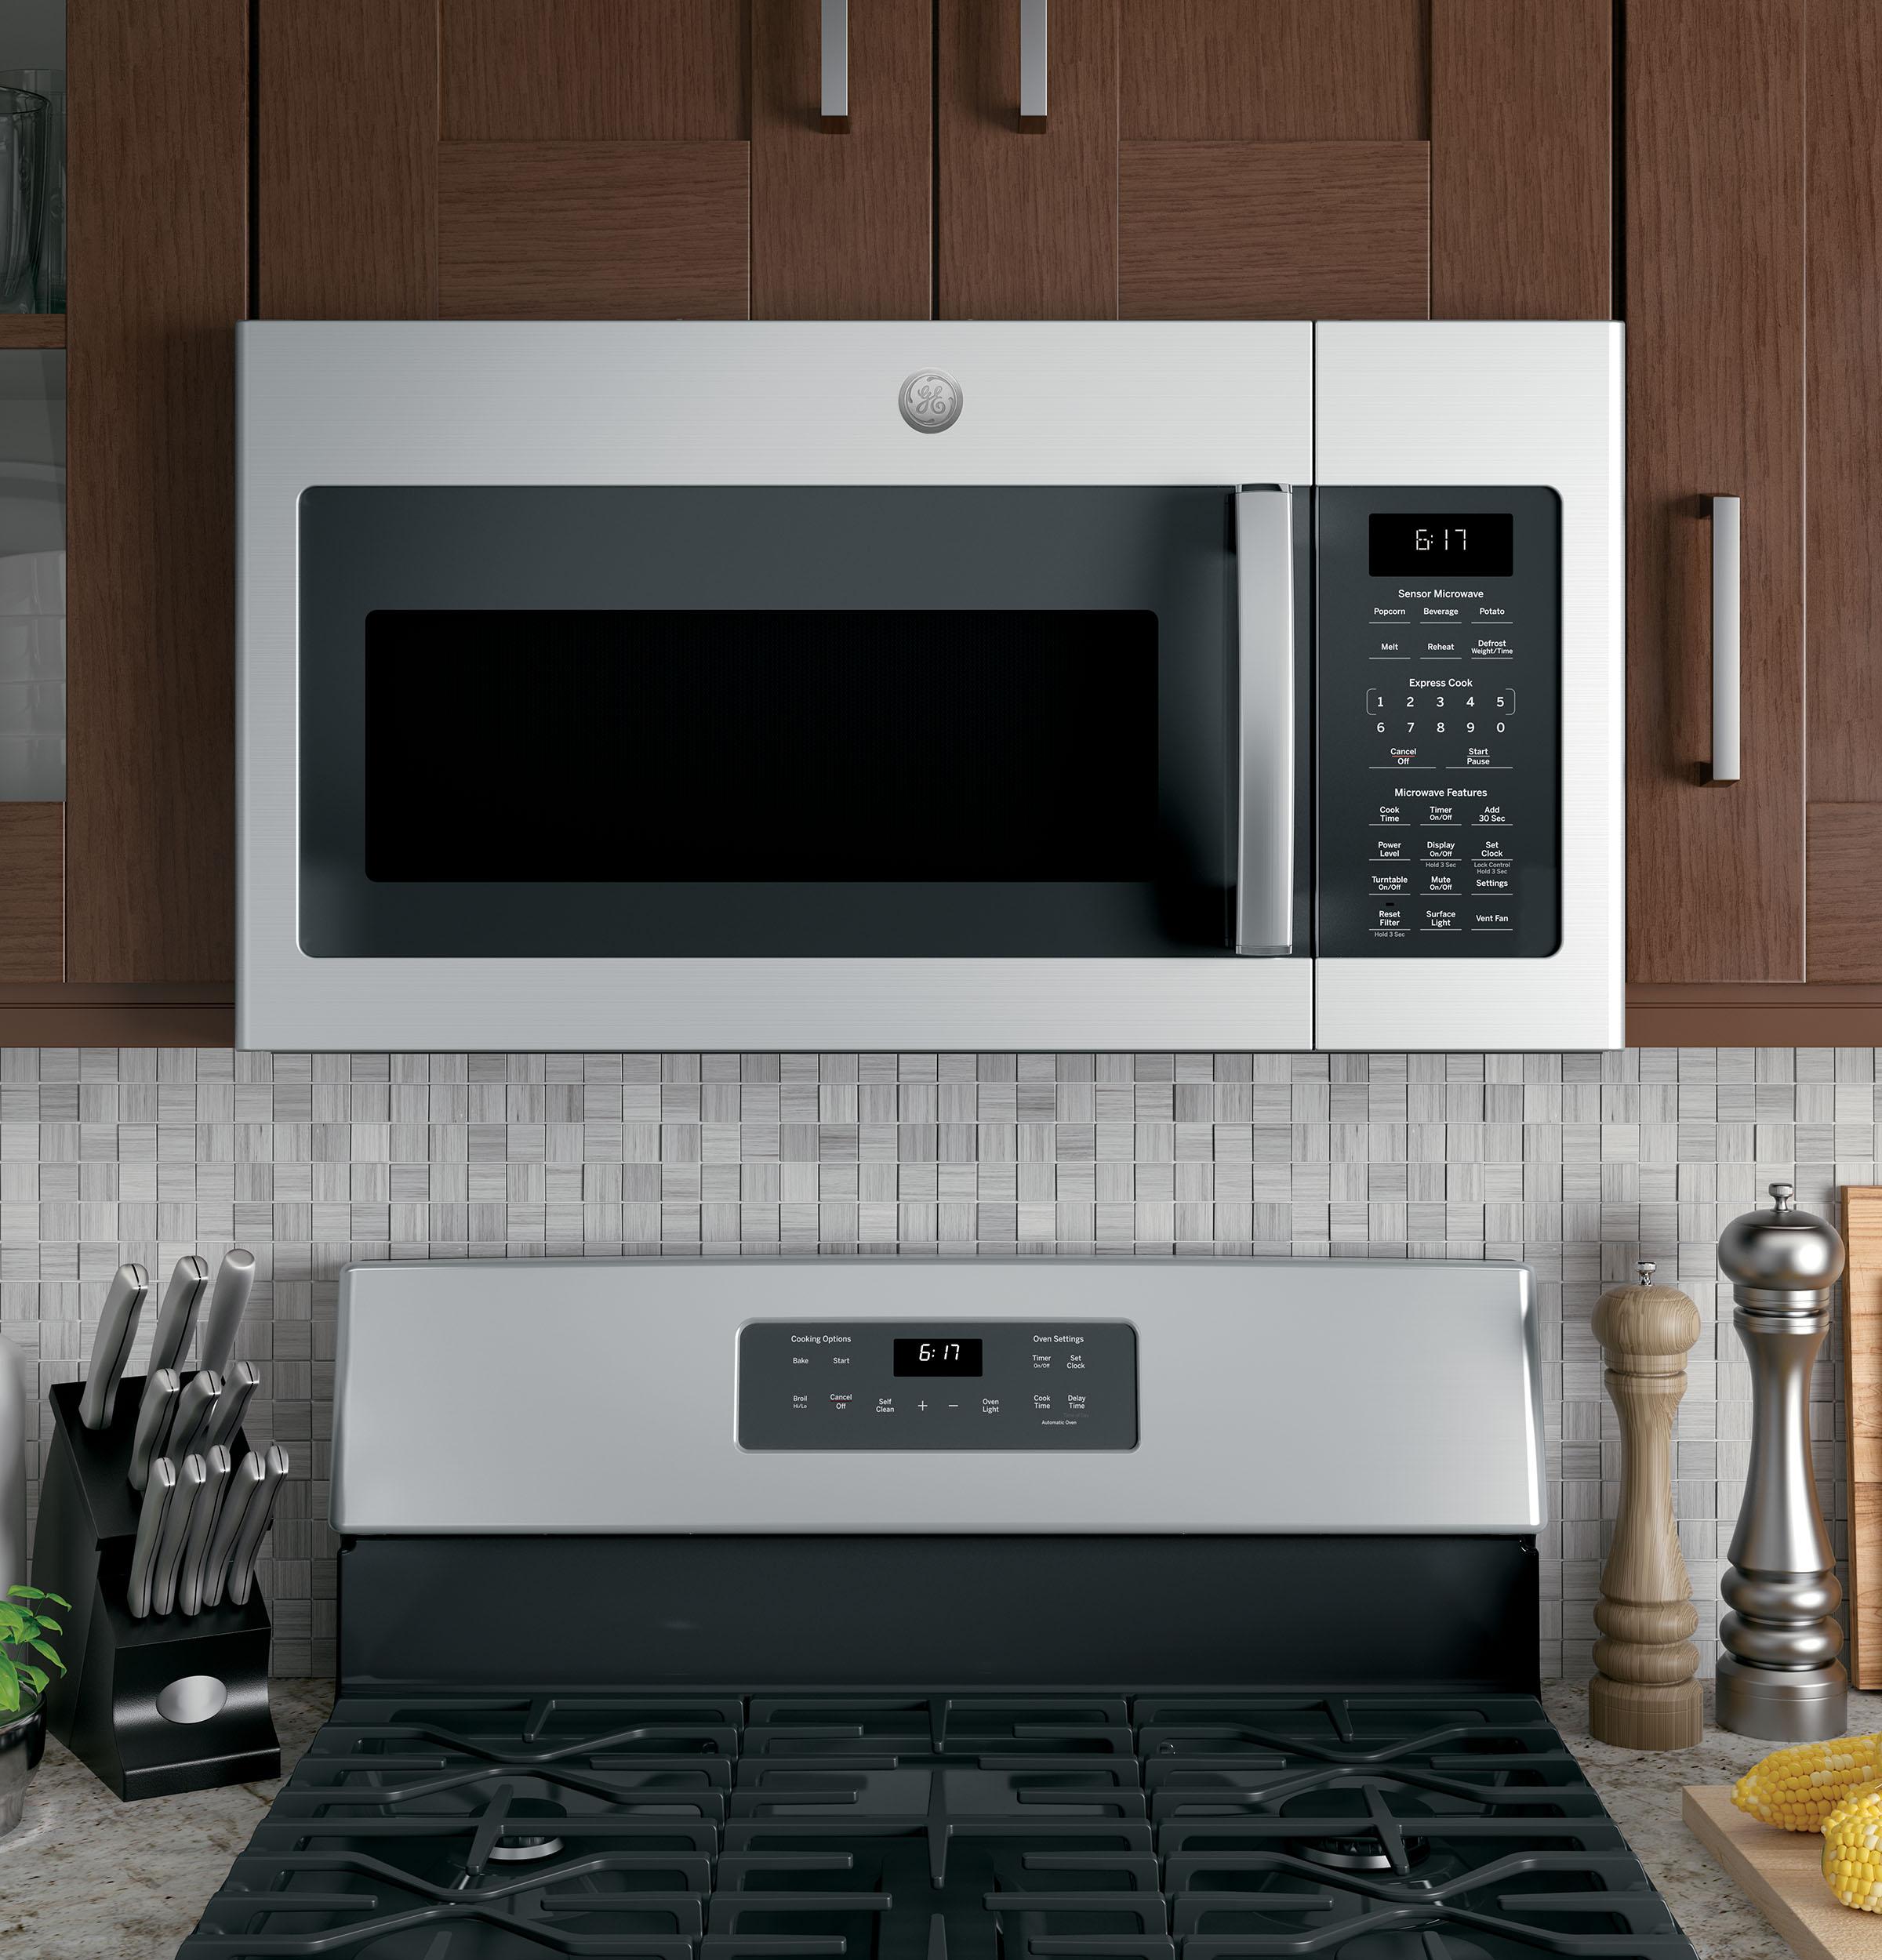 Model: JVM6175SKSS | GE GE® 1.7 Cu. Ft. Over-the-Range Sensor Microwave Oven